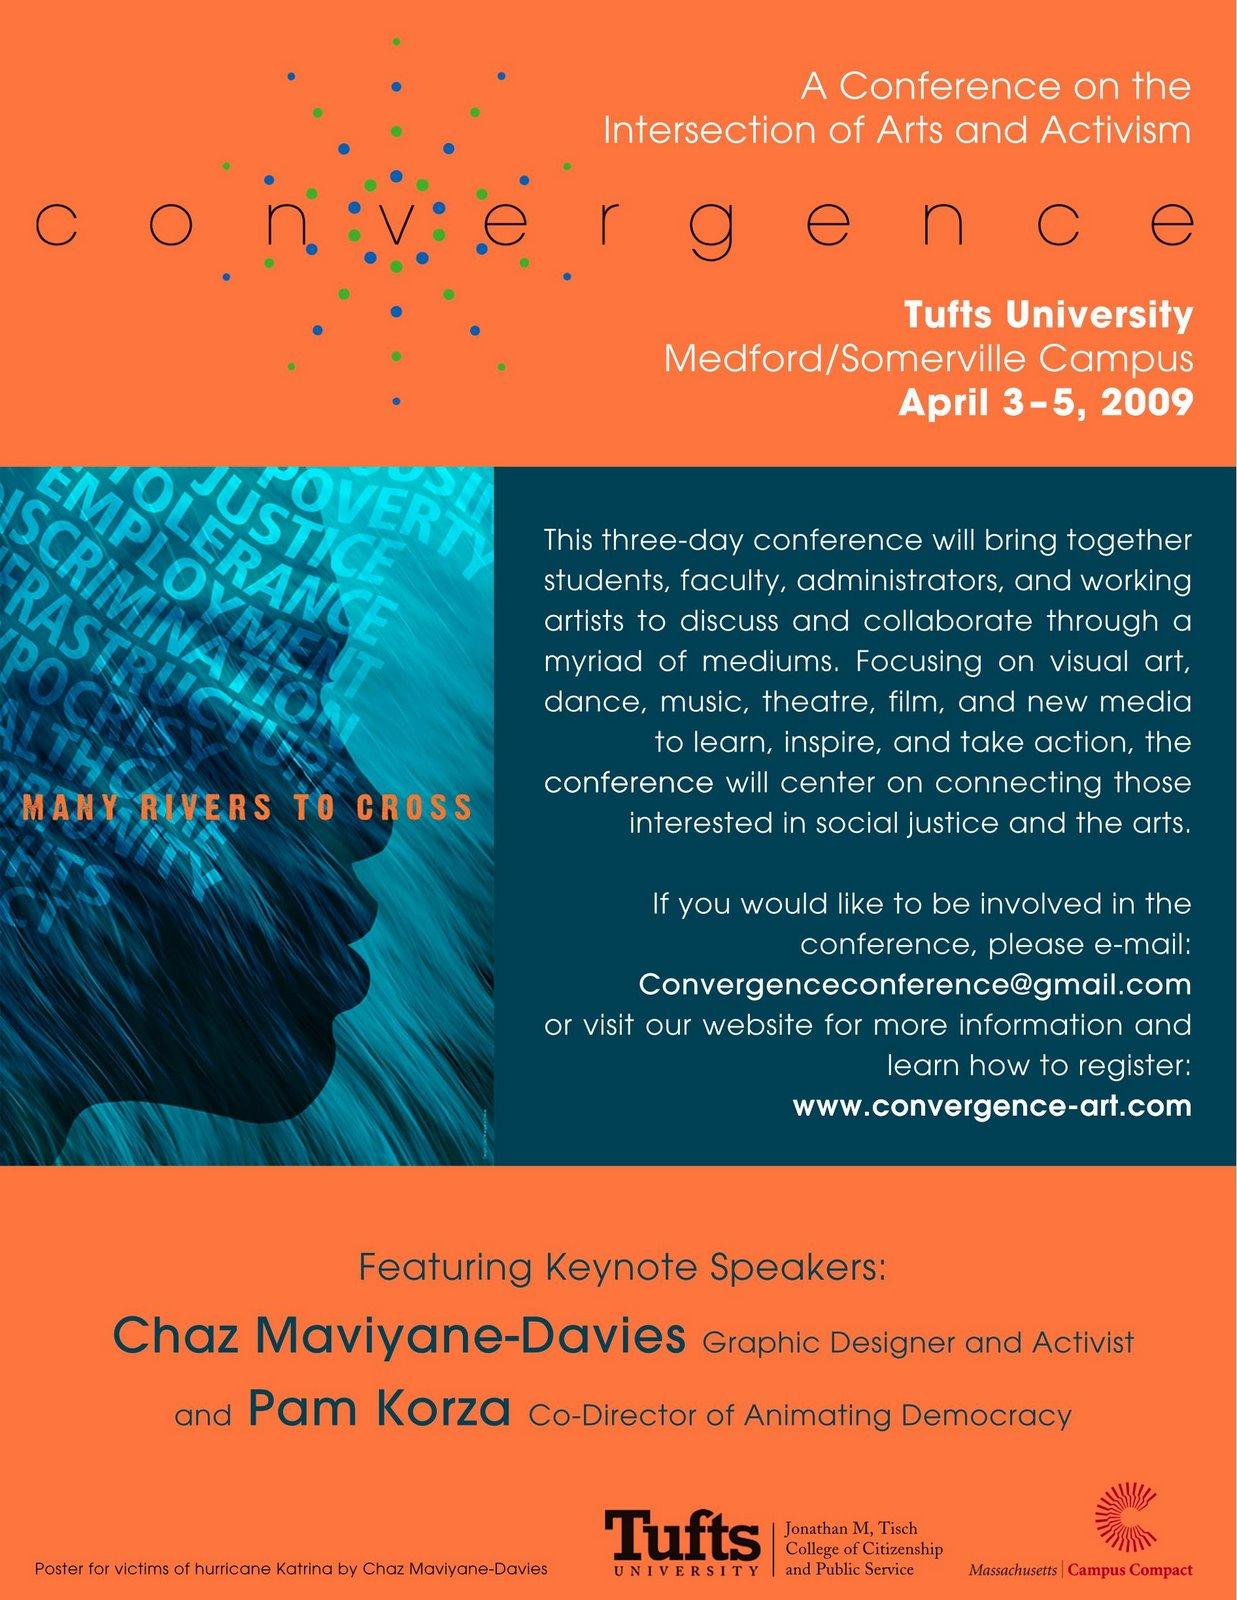 [convergence_flyer.jpg]